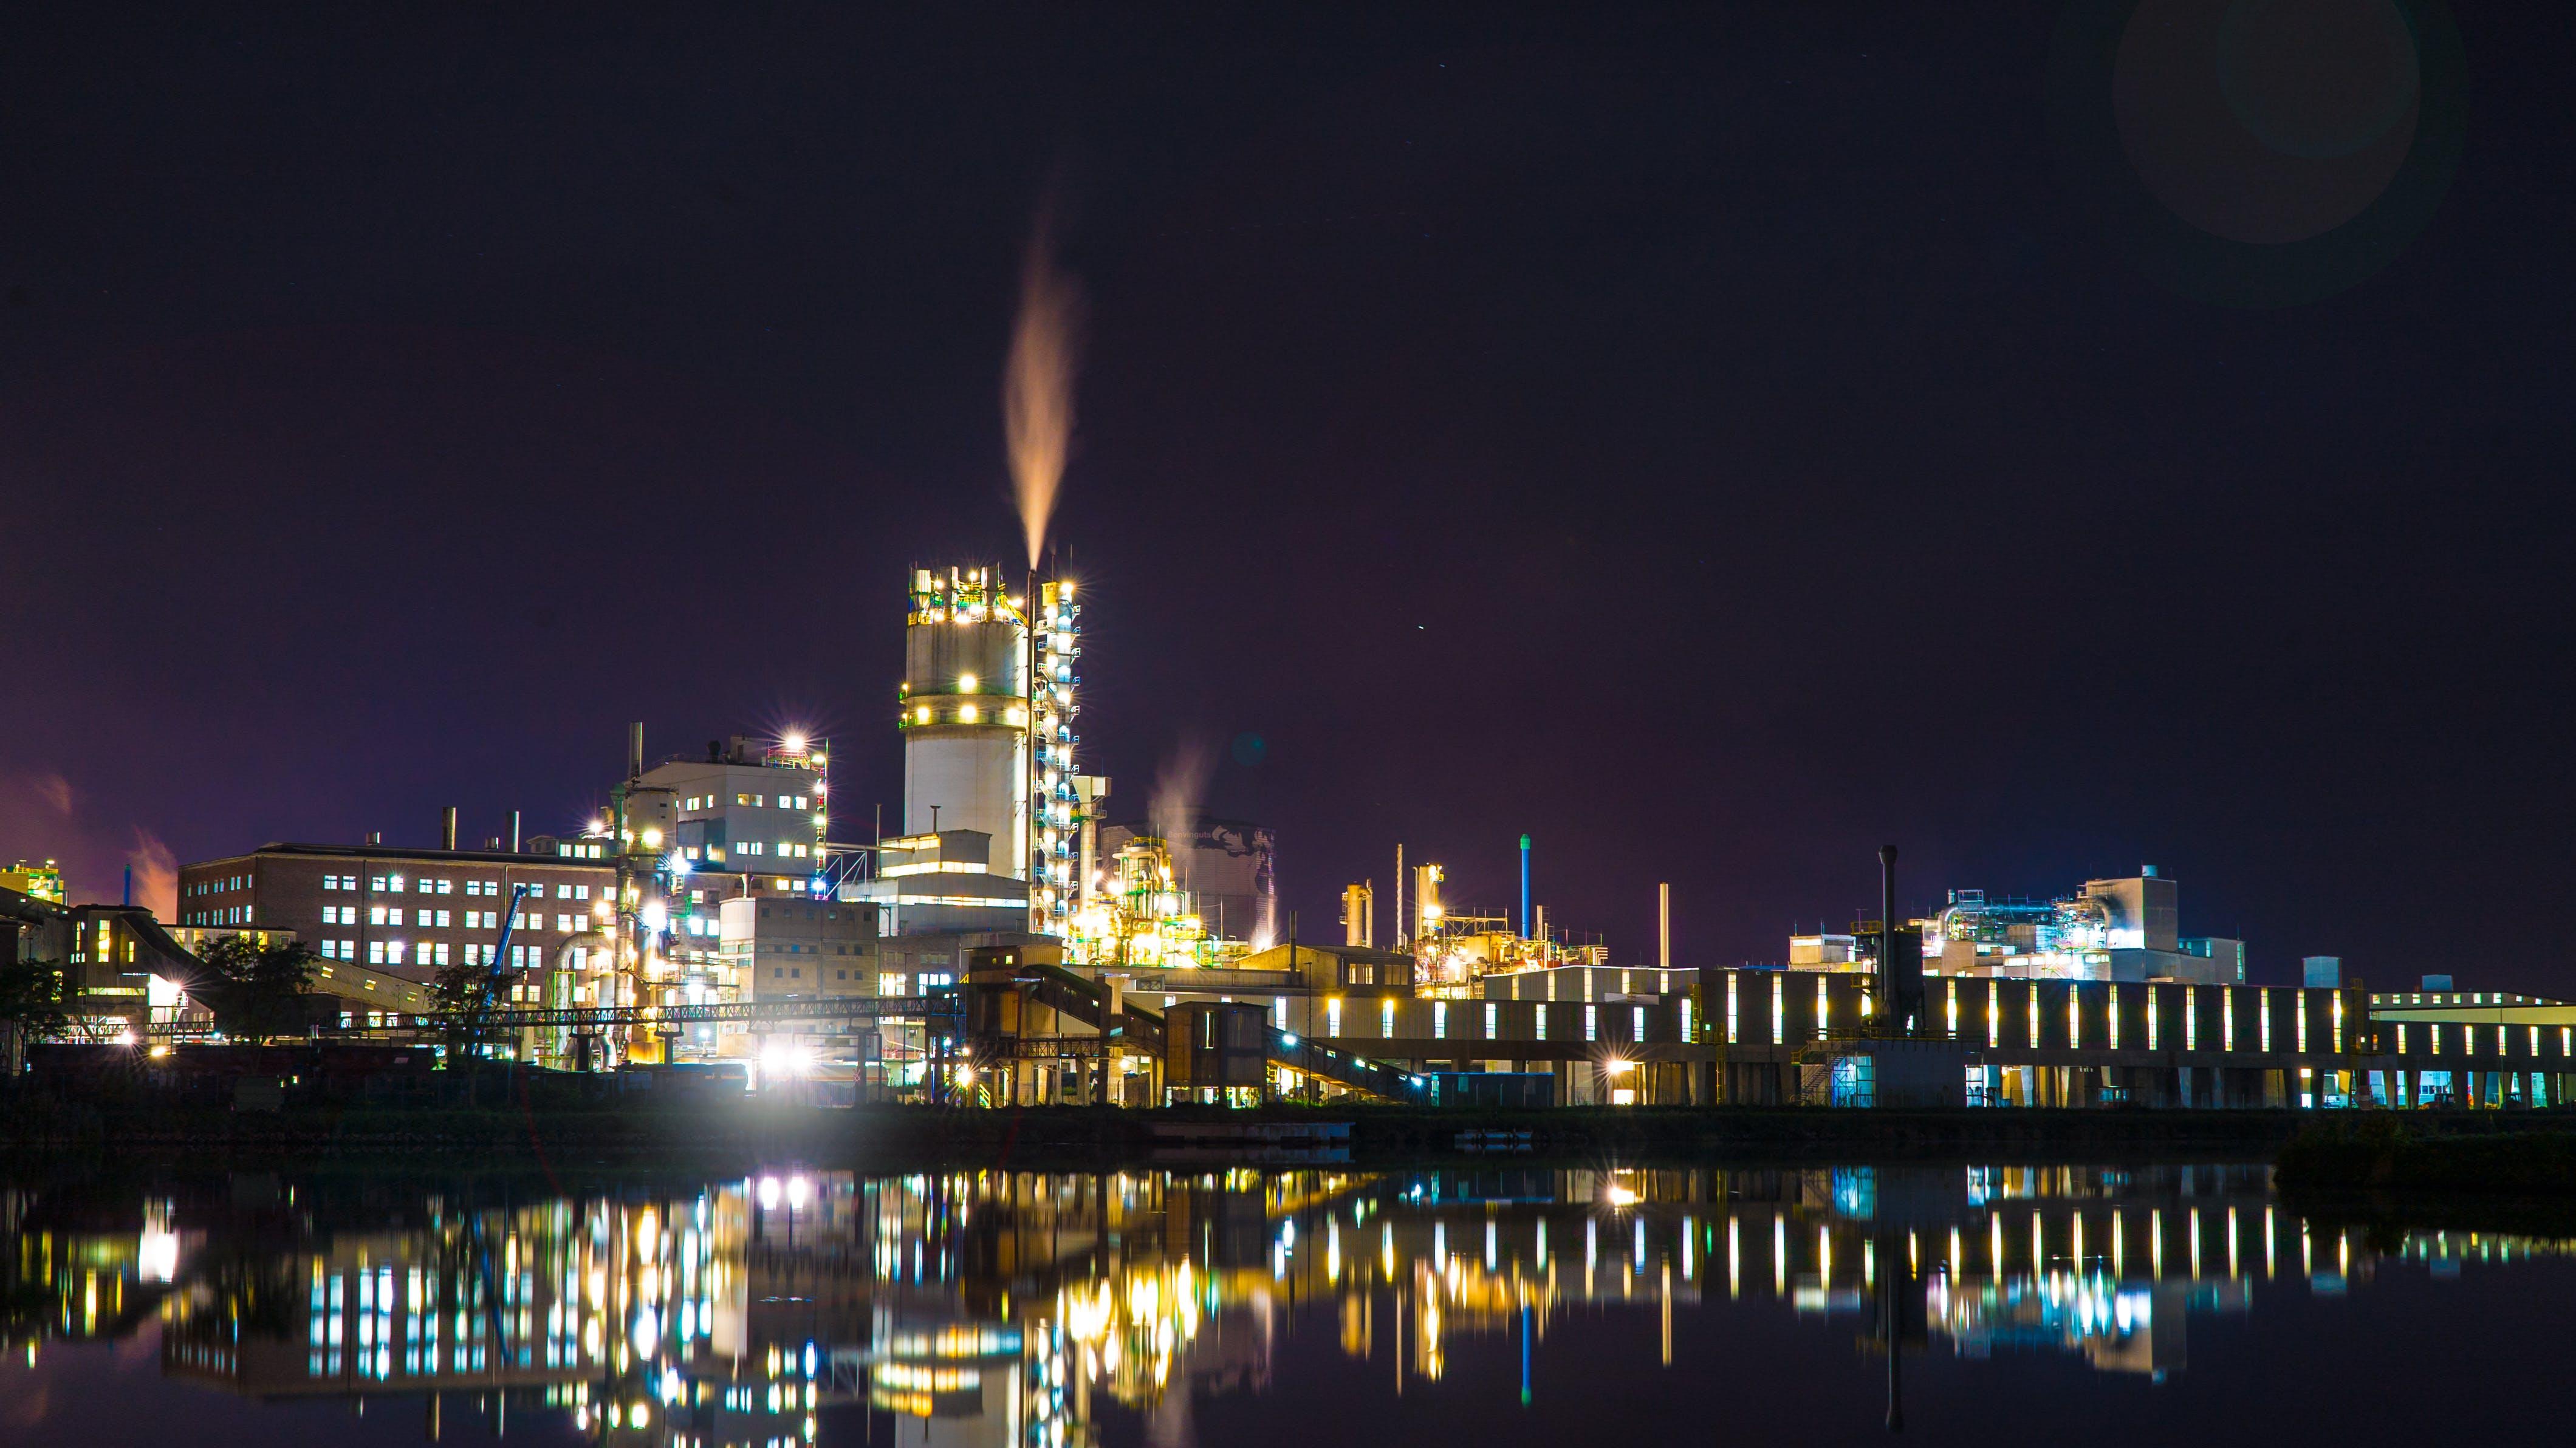 Free stock photo of night, power plant, chimney, mirroring